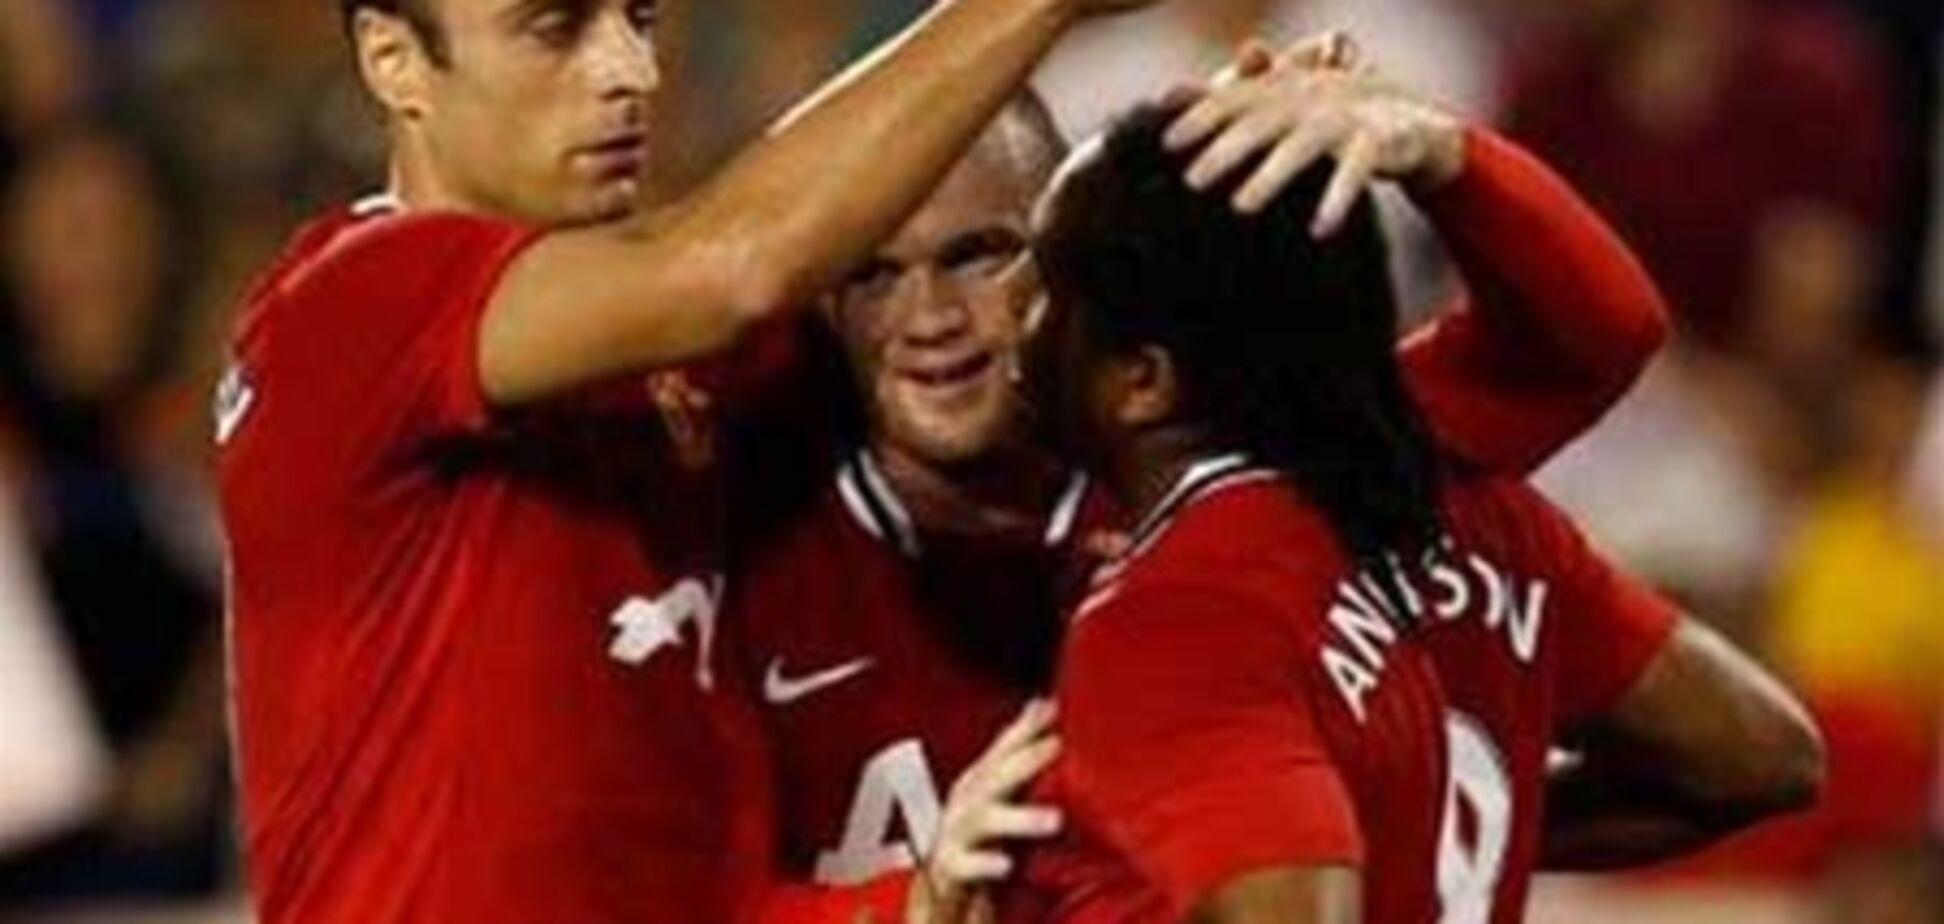 'Манчестер Юнайтед' разгромил команду Дэвида Бекхэма